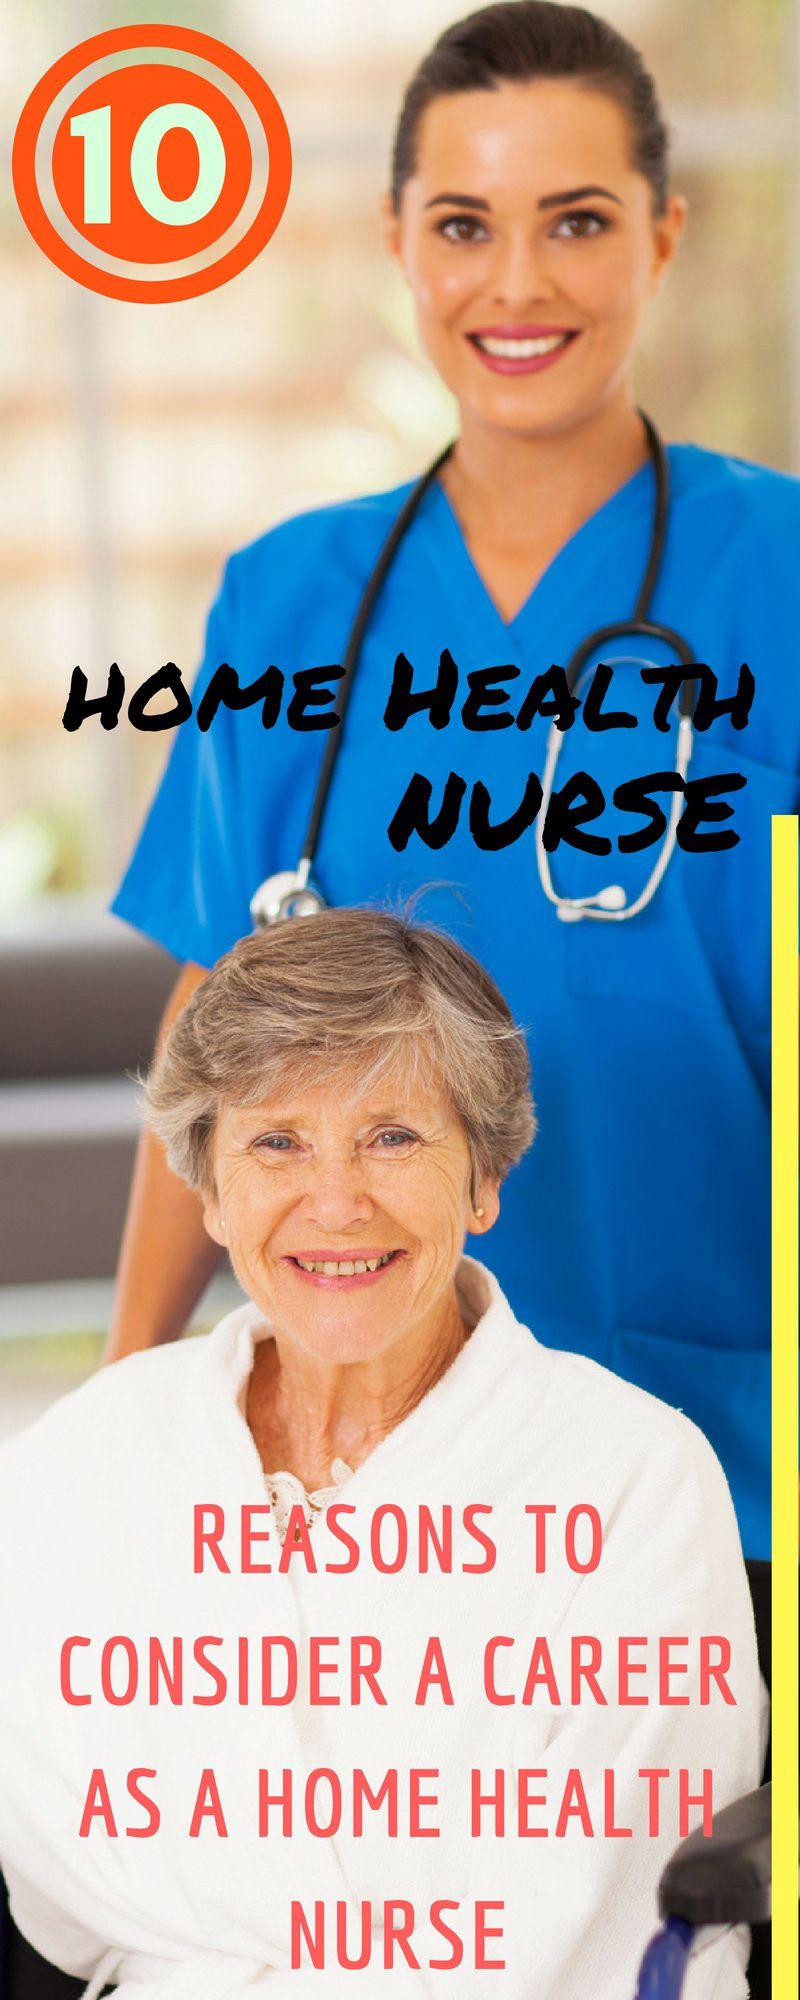 Home Health Nurse Salary, Job Description, Duties and